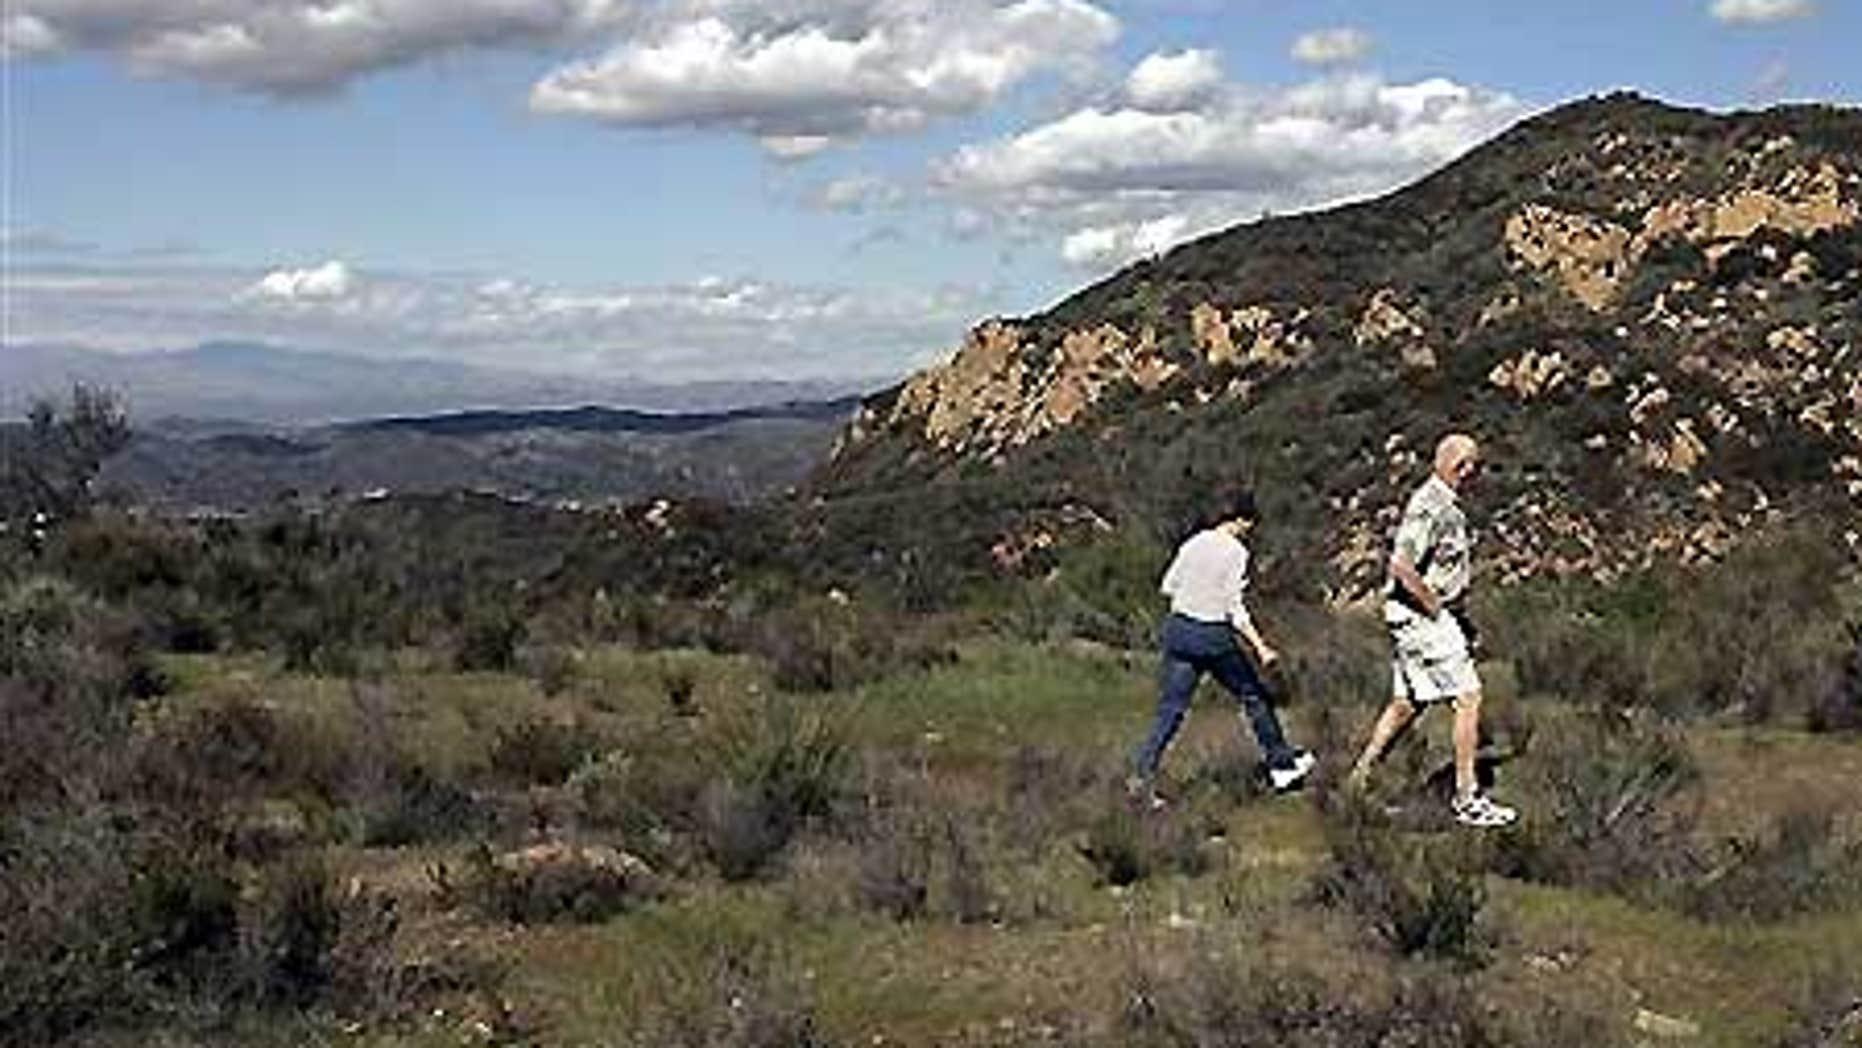 Negrohead Mountain as seen from a bluff above Kanan Road near Malibu, Calif.